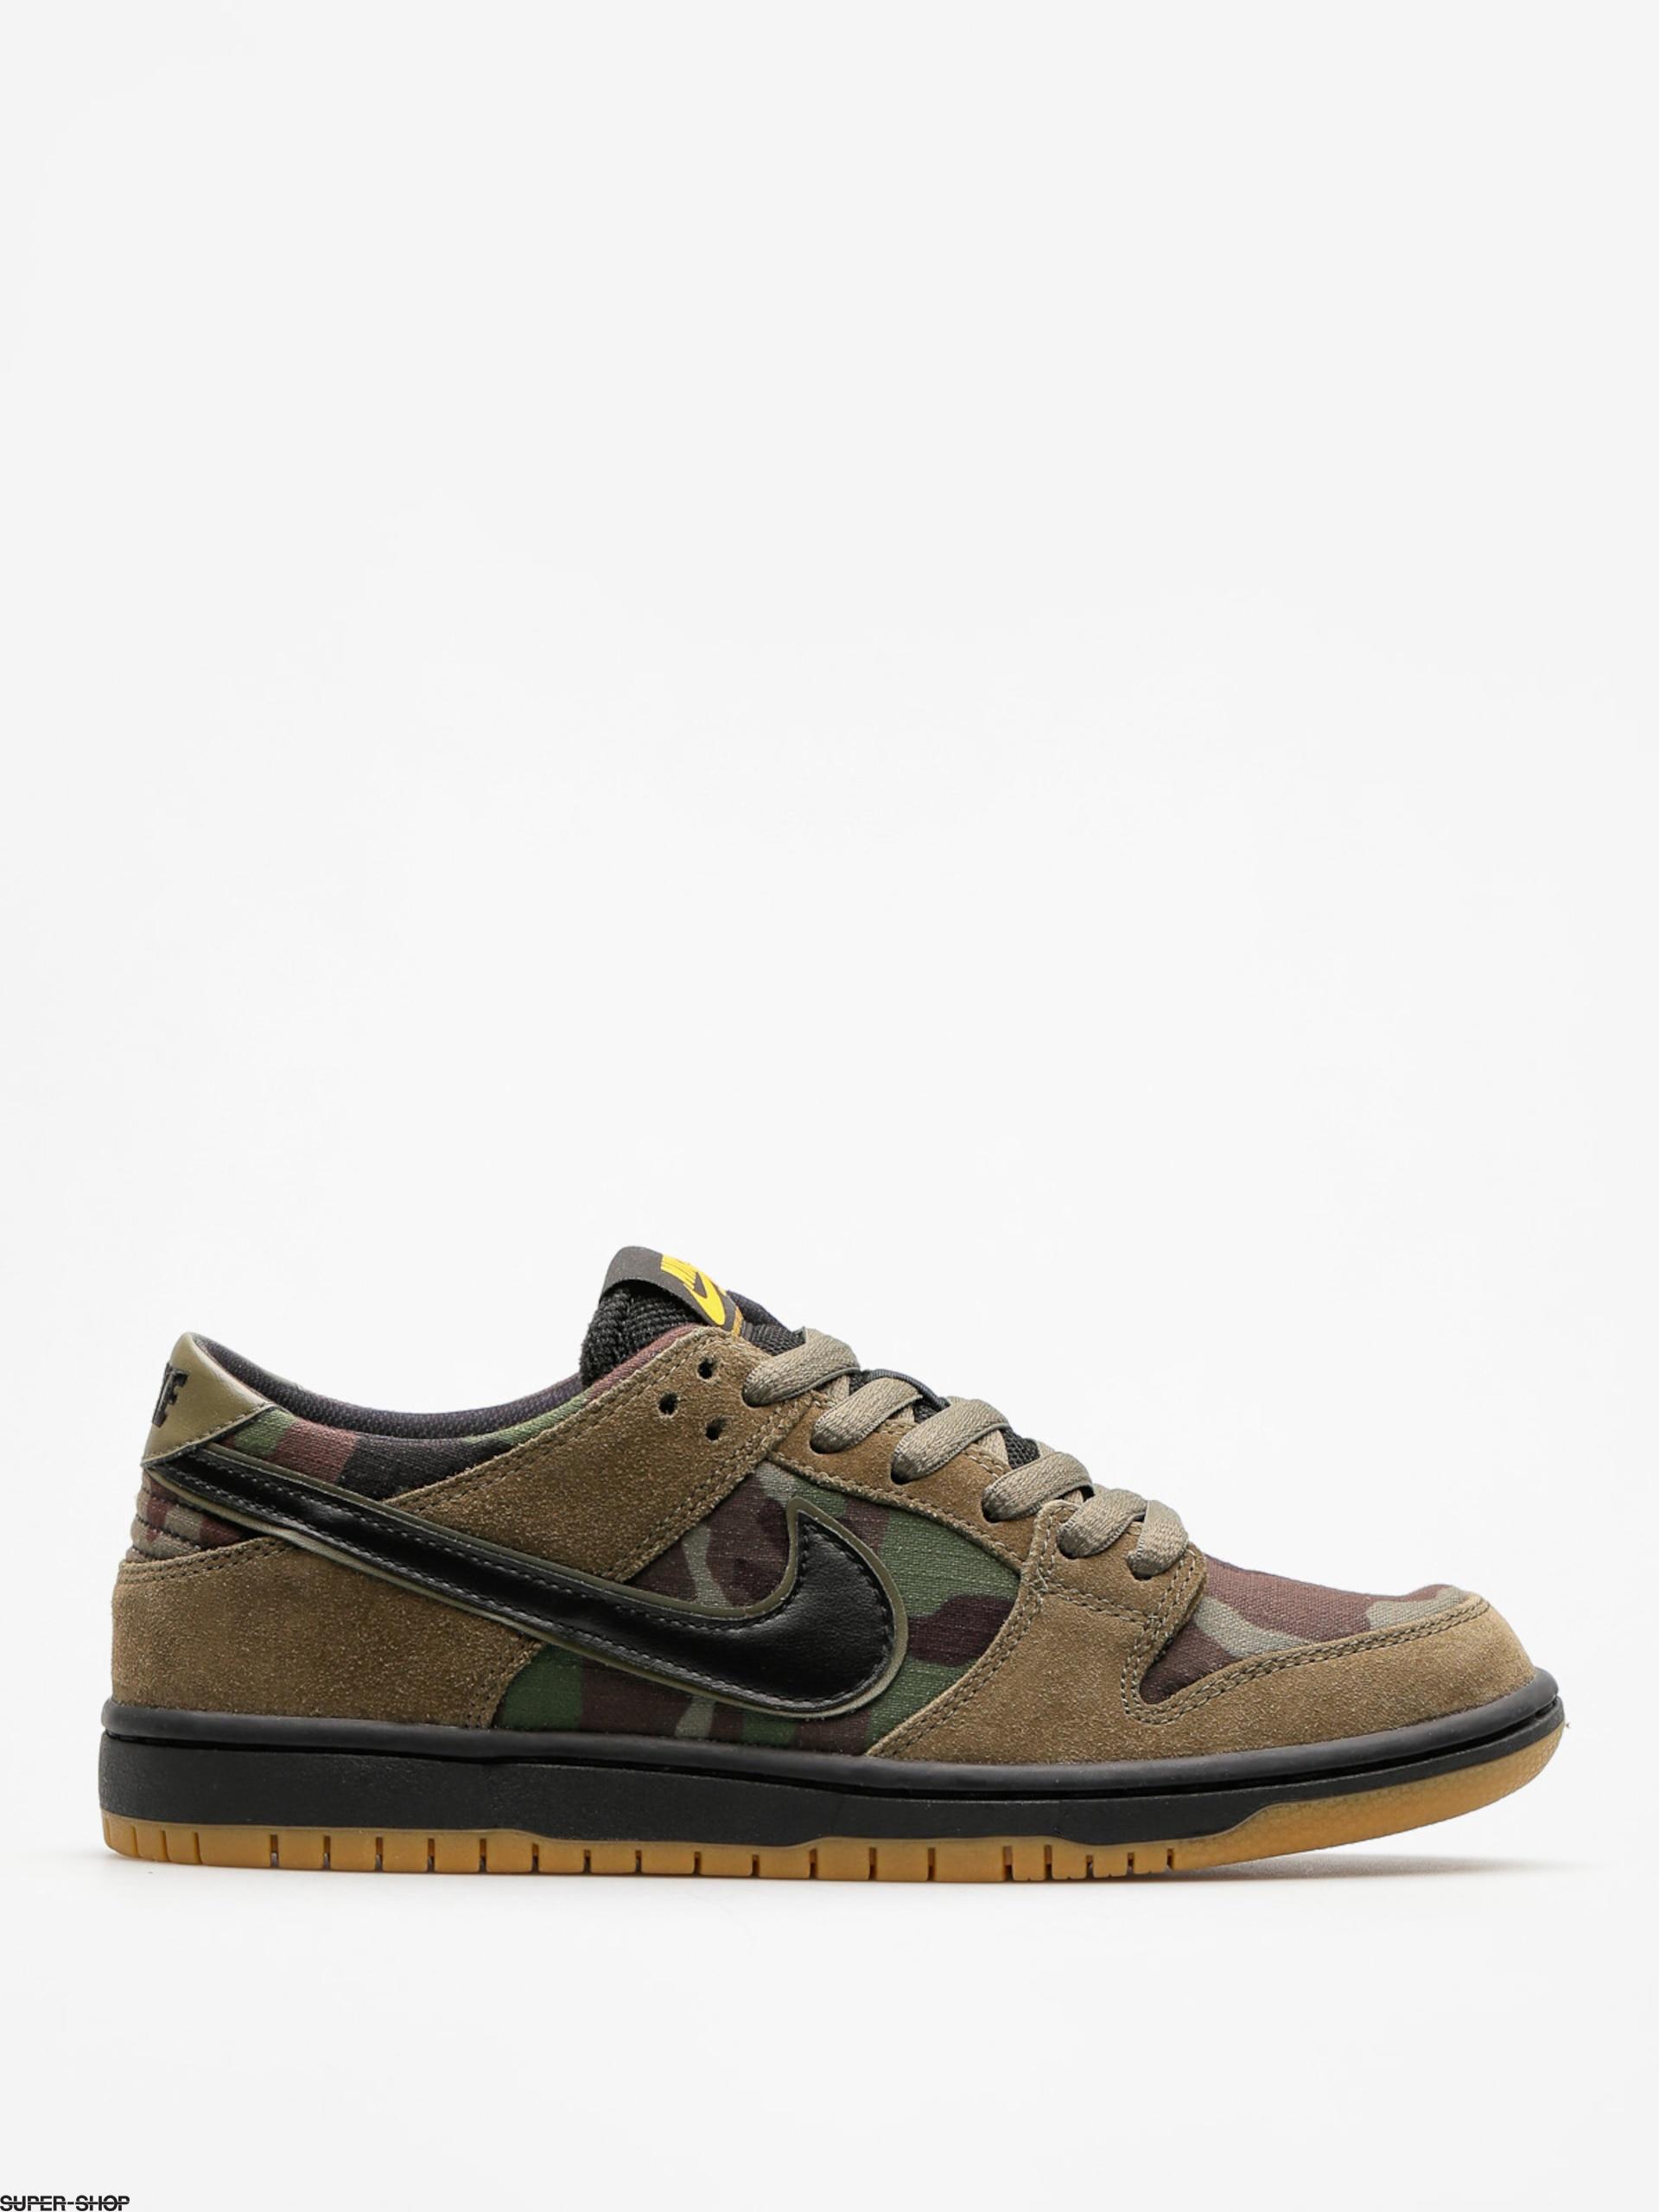 sneakers for cheap b52b7 5b1d7 ... usa nike sb shoes zoom dunk low pro medium olive black gum light brown  4bb3e 51d43